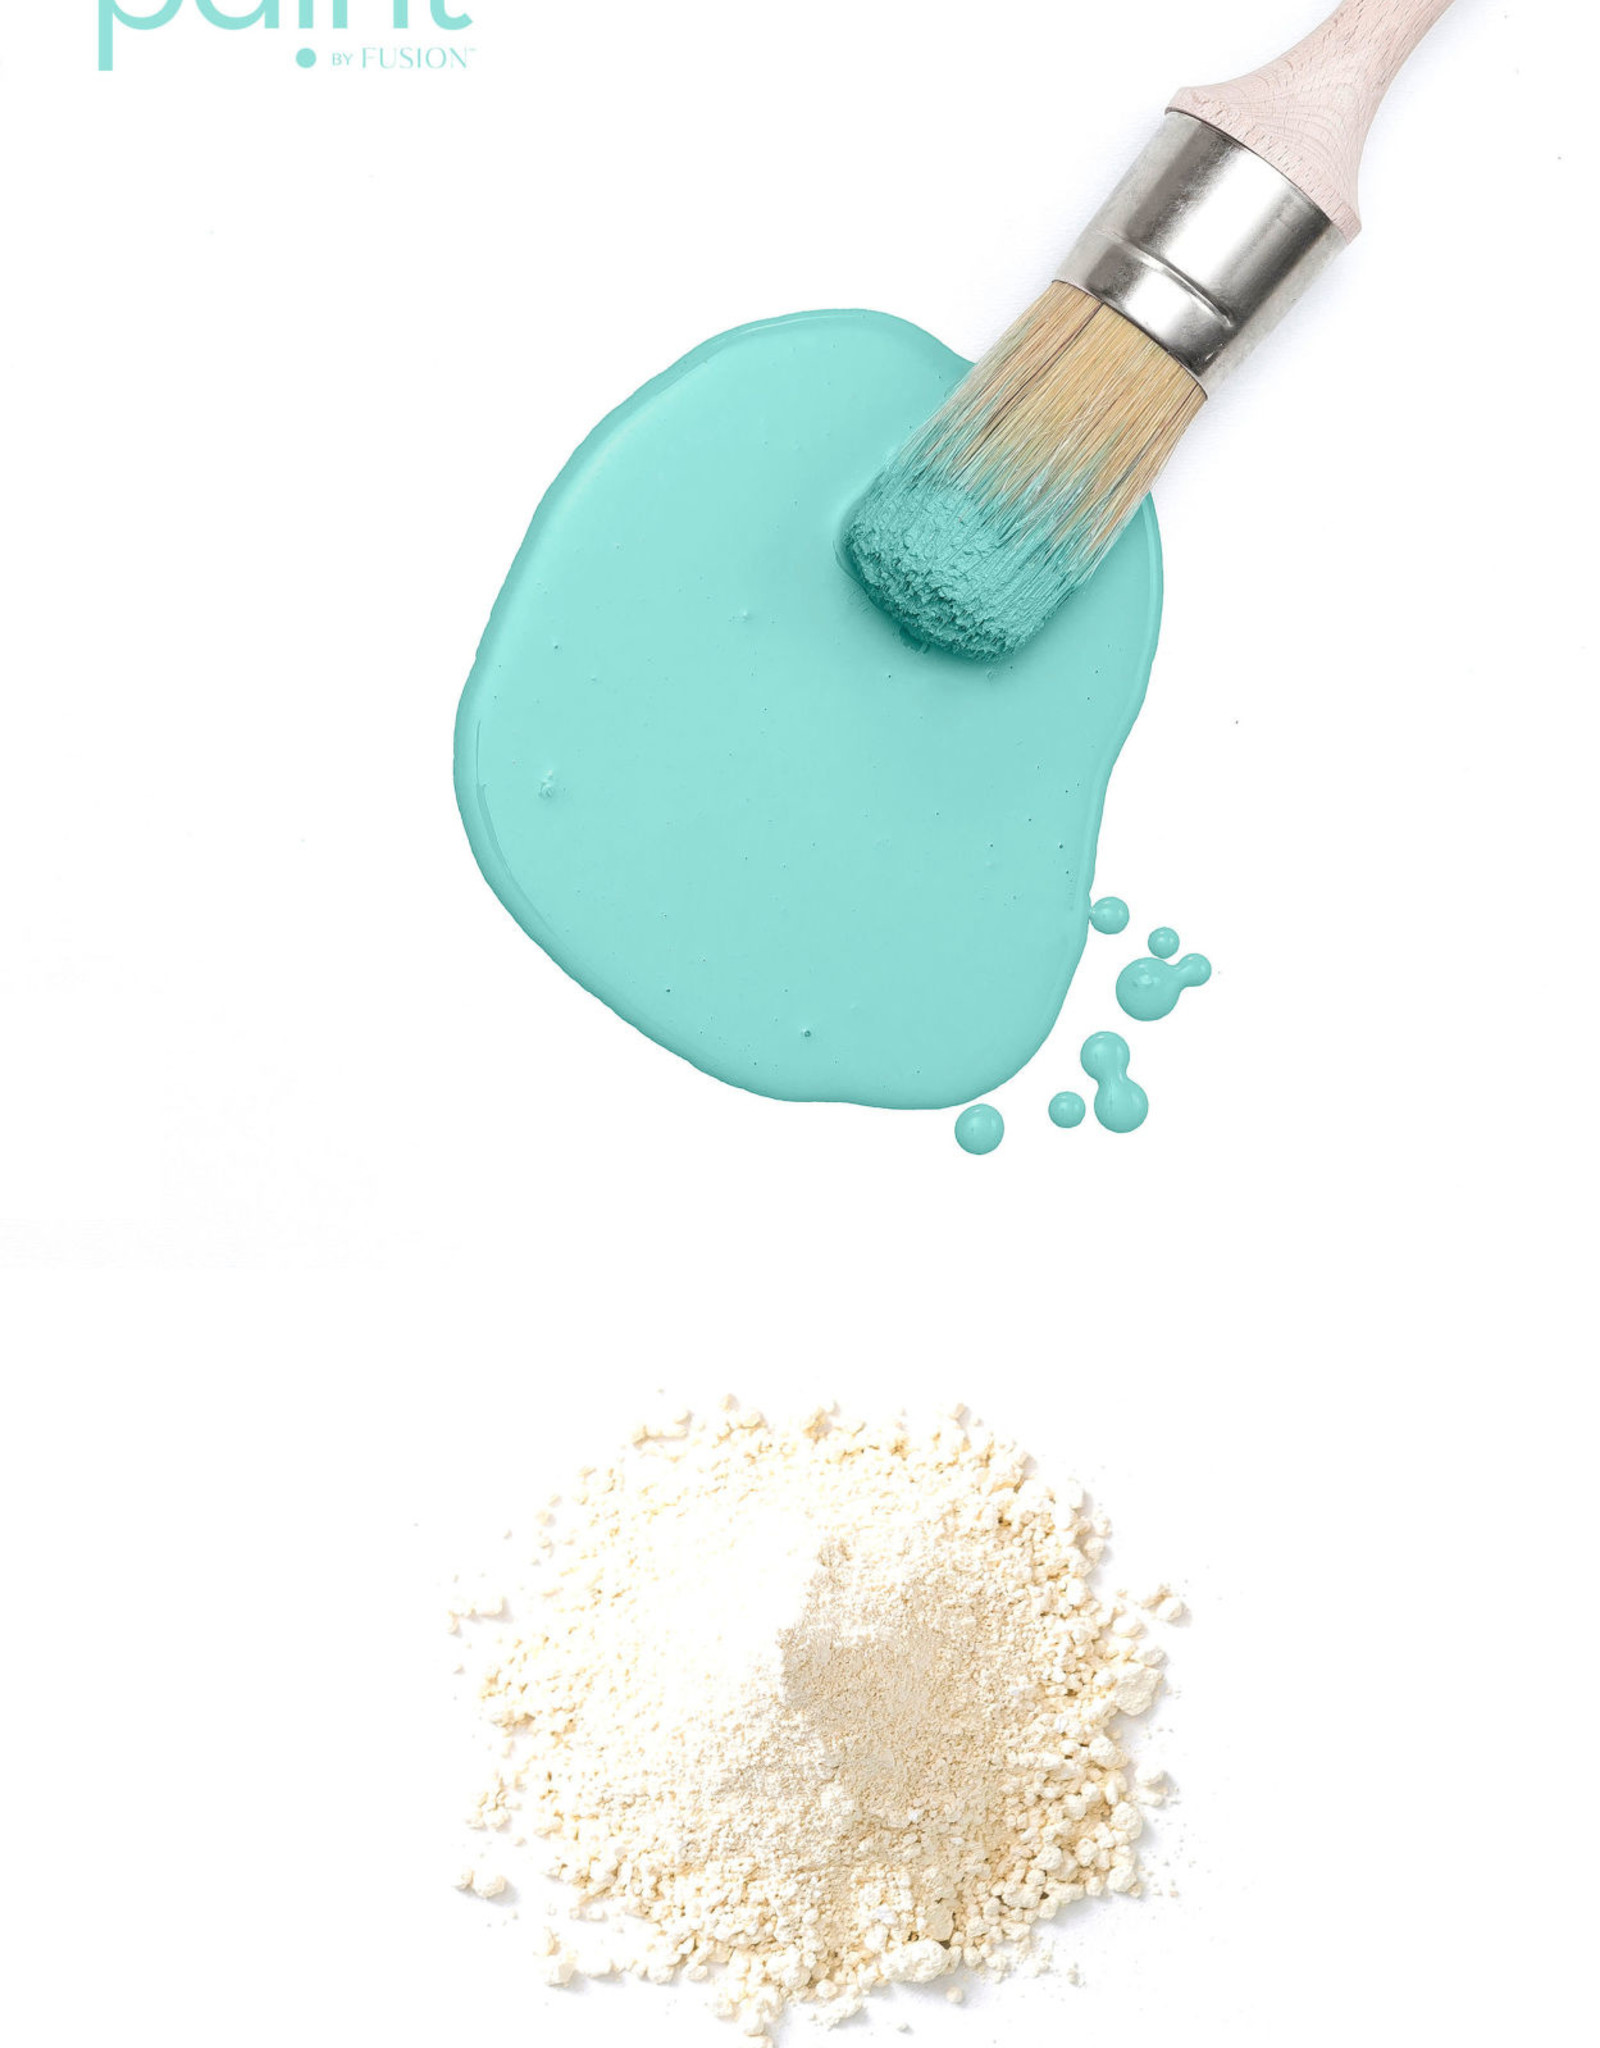 Fusion Mineral Paint Milk Paint 50g Amalfi Coast